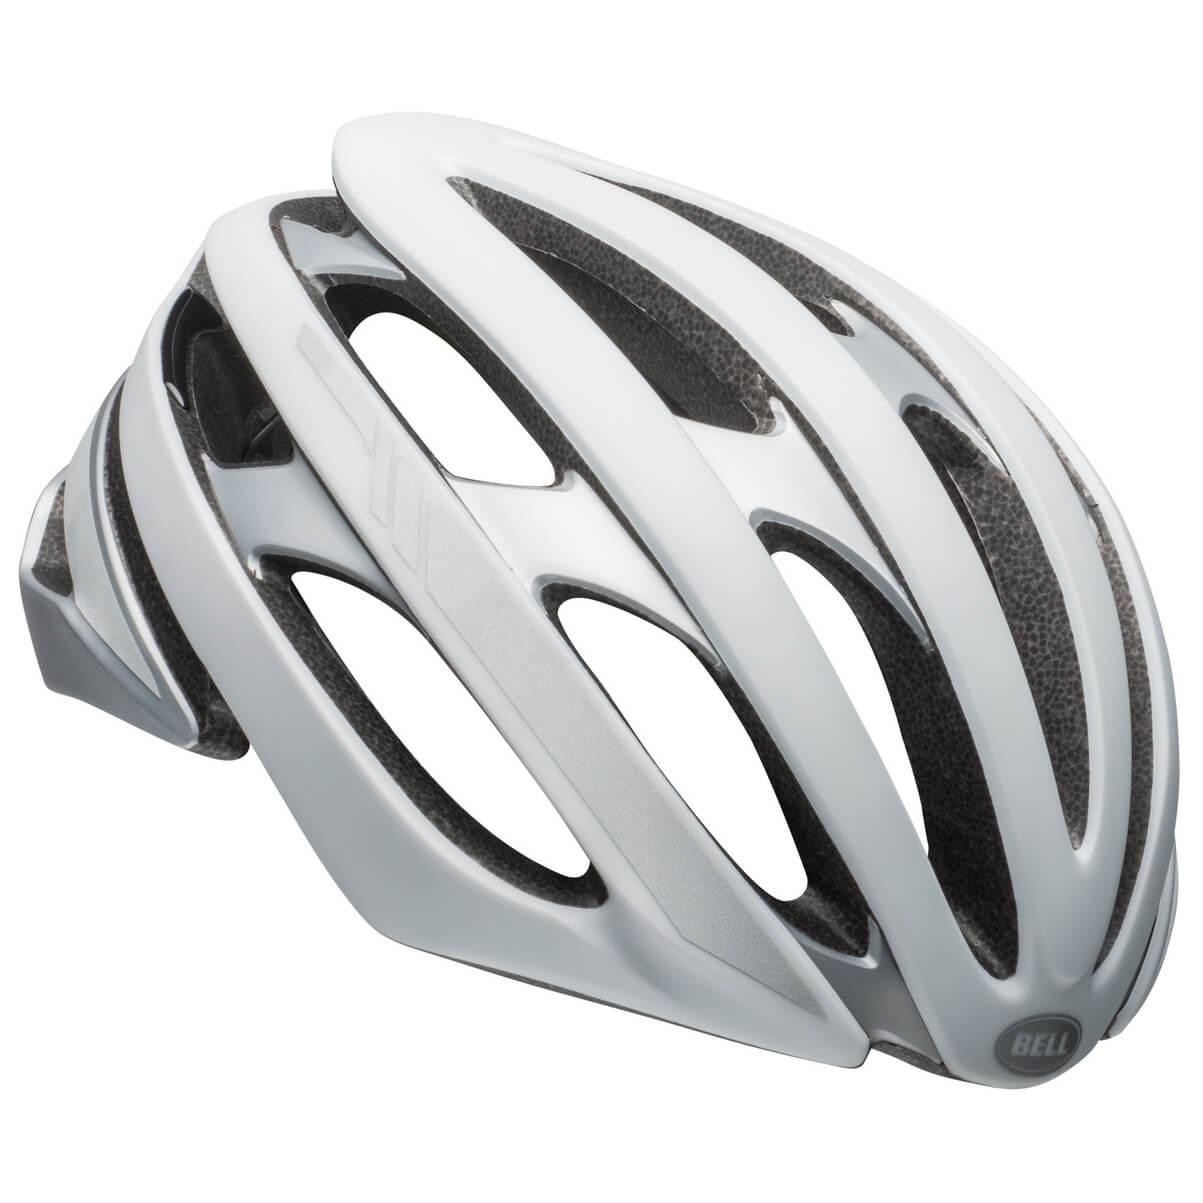 55c9ed861b6 Bell - Stratus MIPS Reflective - Bicycle helmet